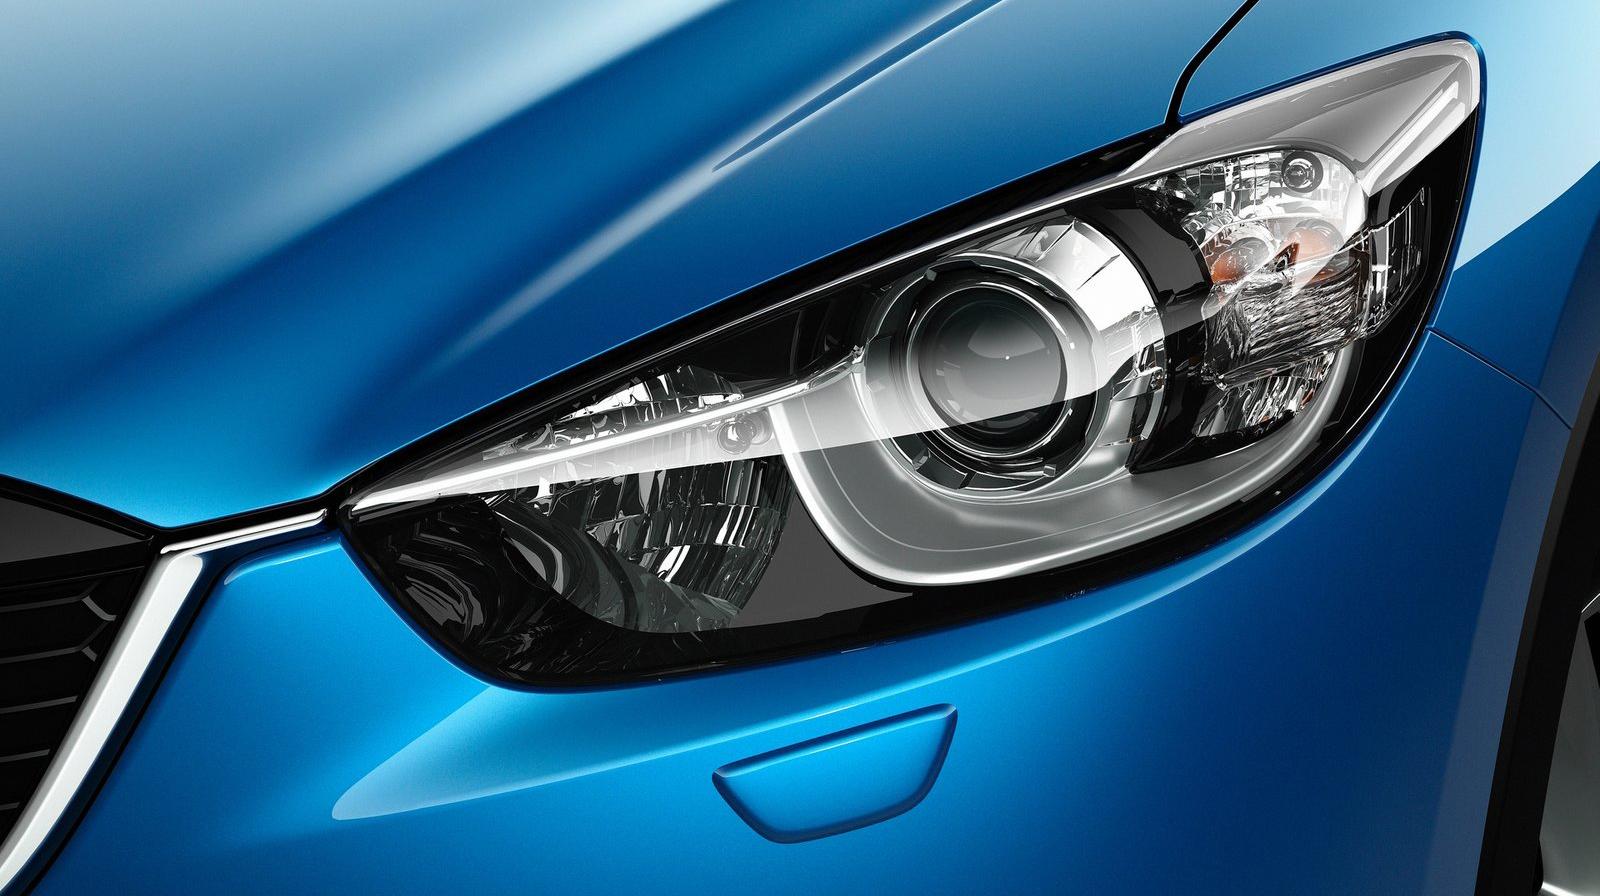 So sánh Honda CR-V và Mazda CX-5